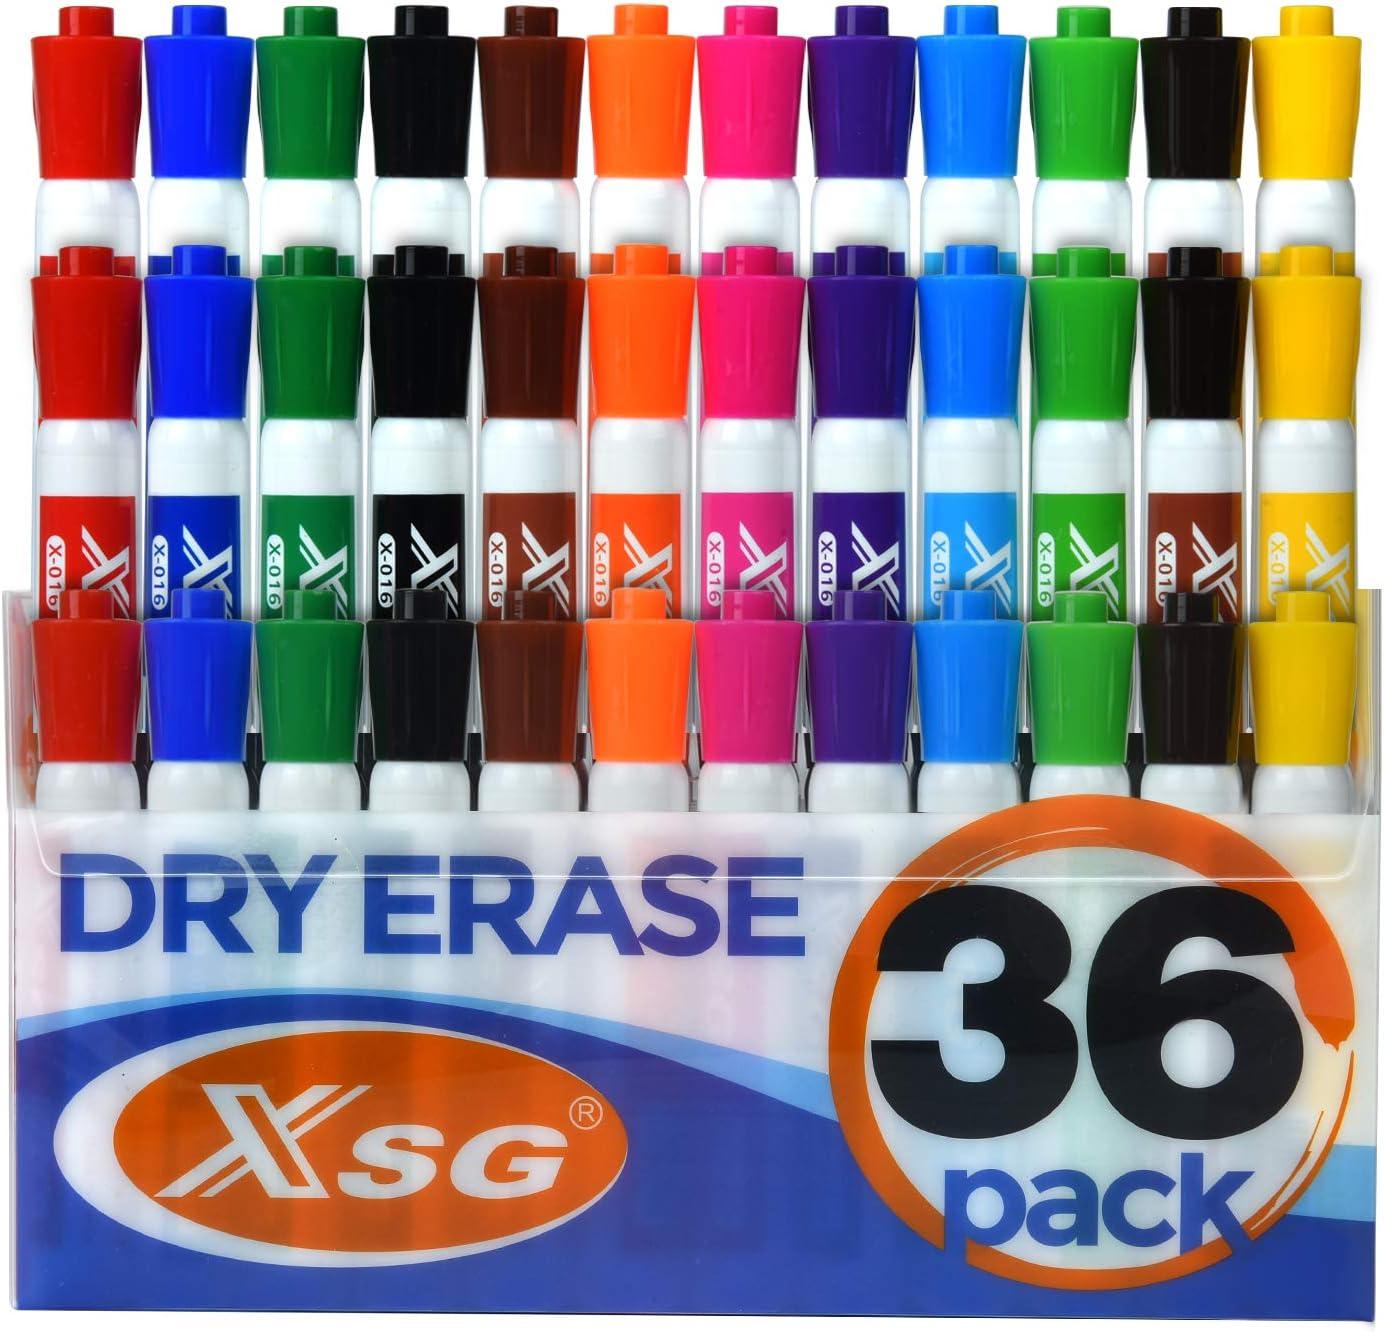 Dry Erase chisel tip Marker Pen Year-end gift Bulk 12 XSG Pack) Factory outlet (36